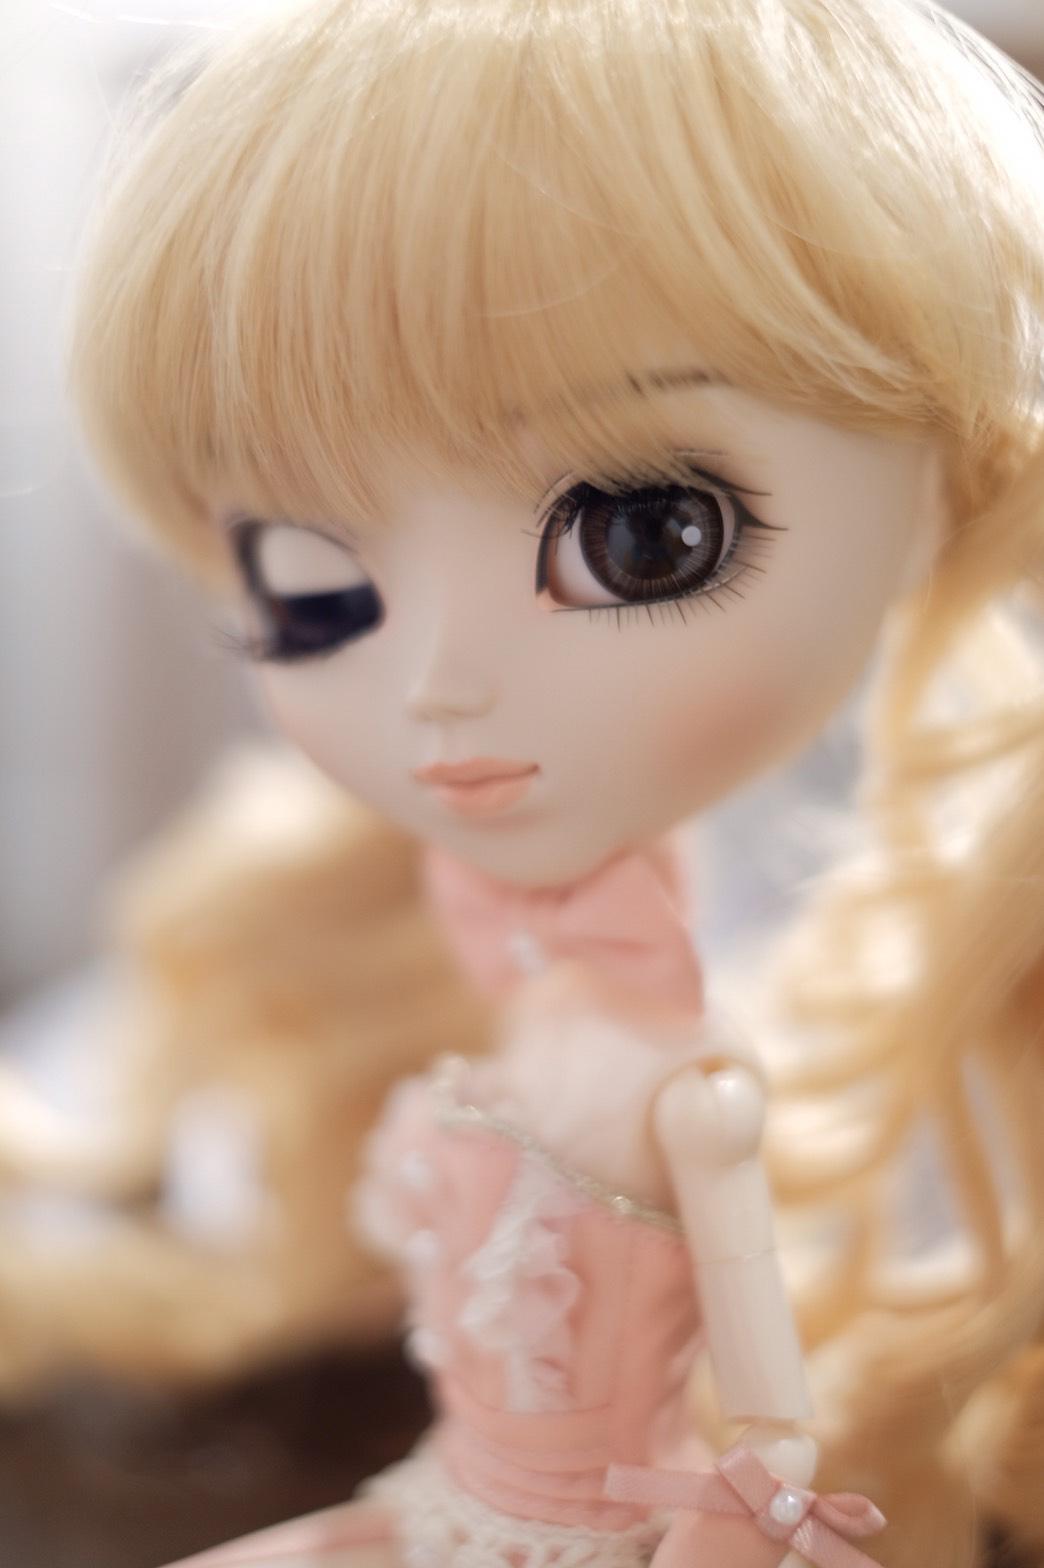 fujisato_170628_02.jpg